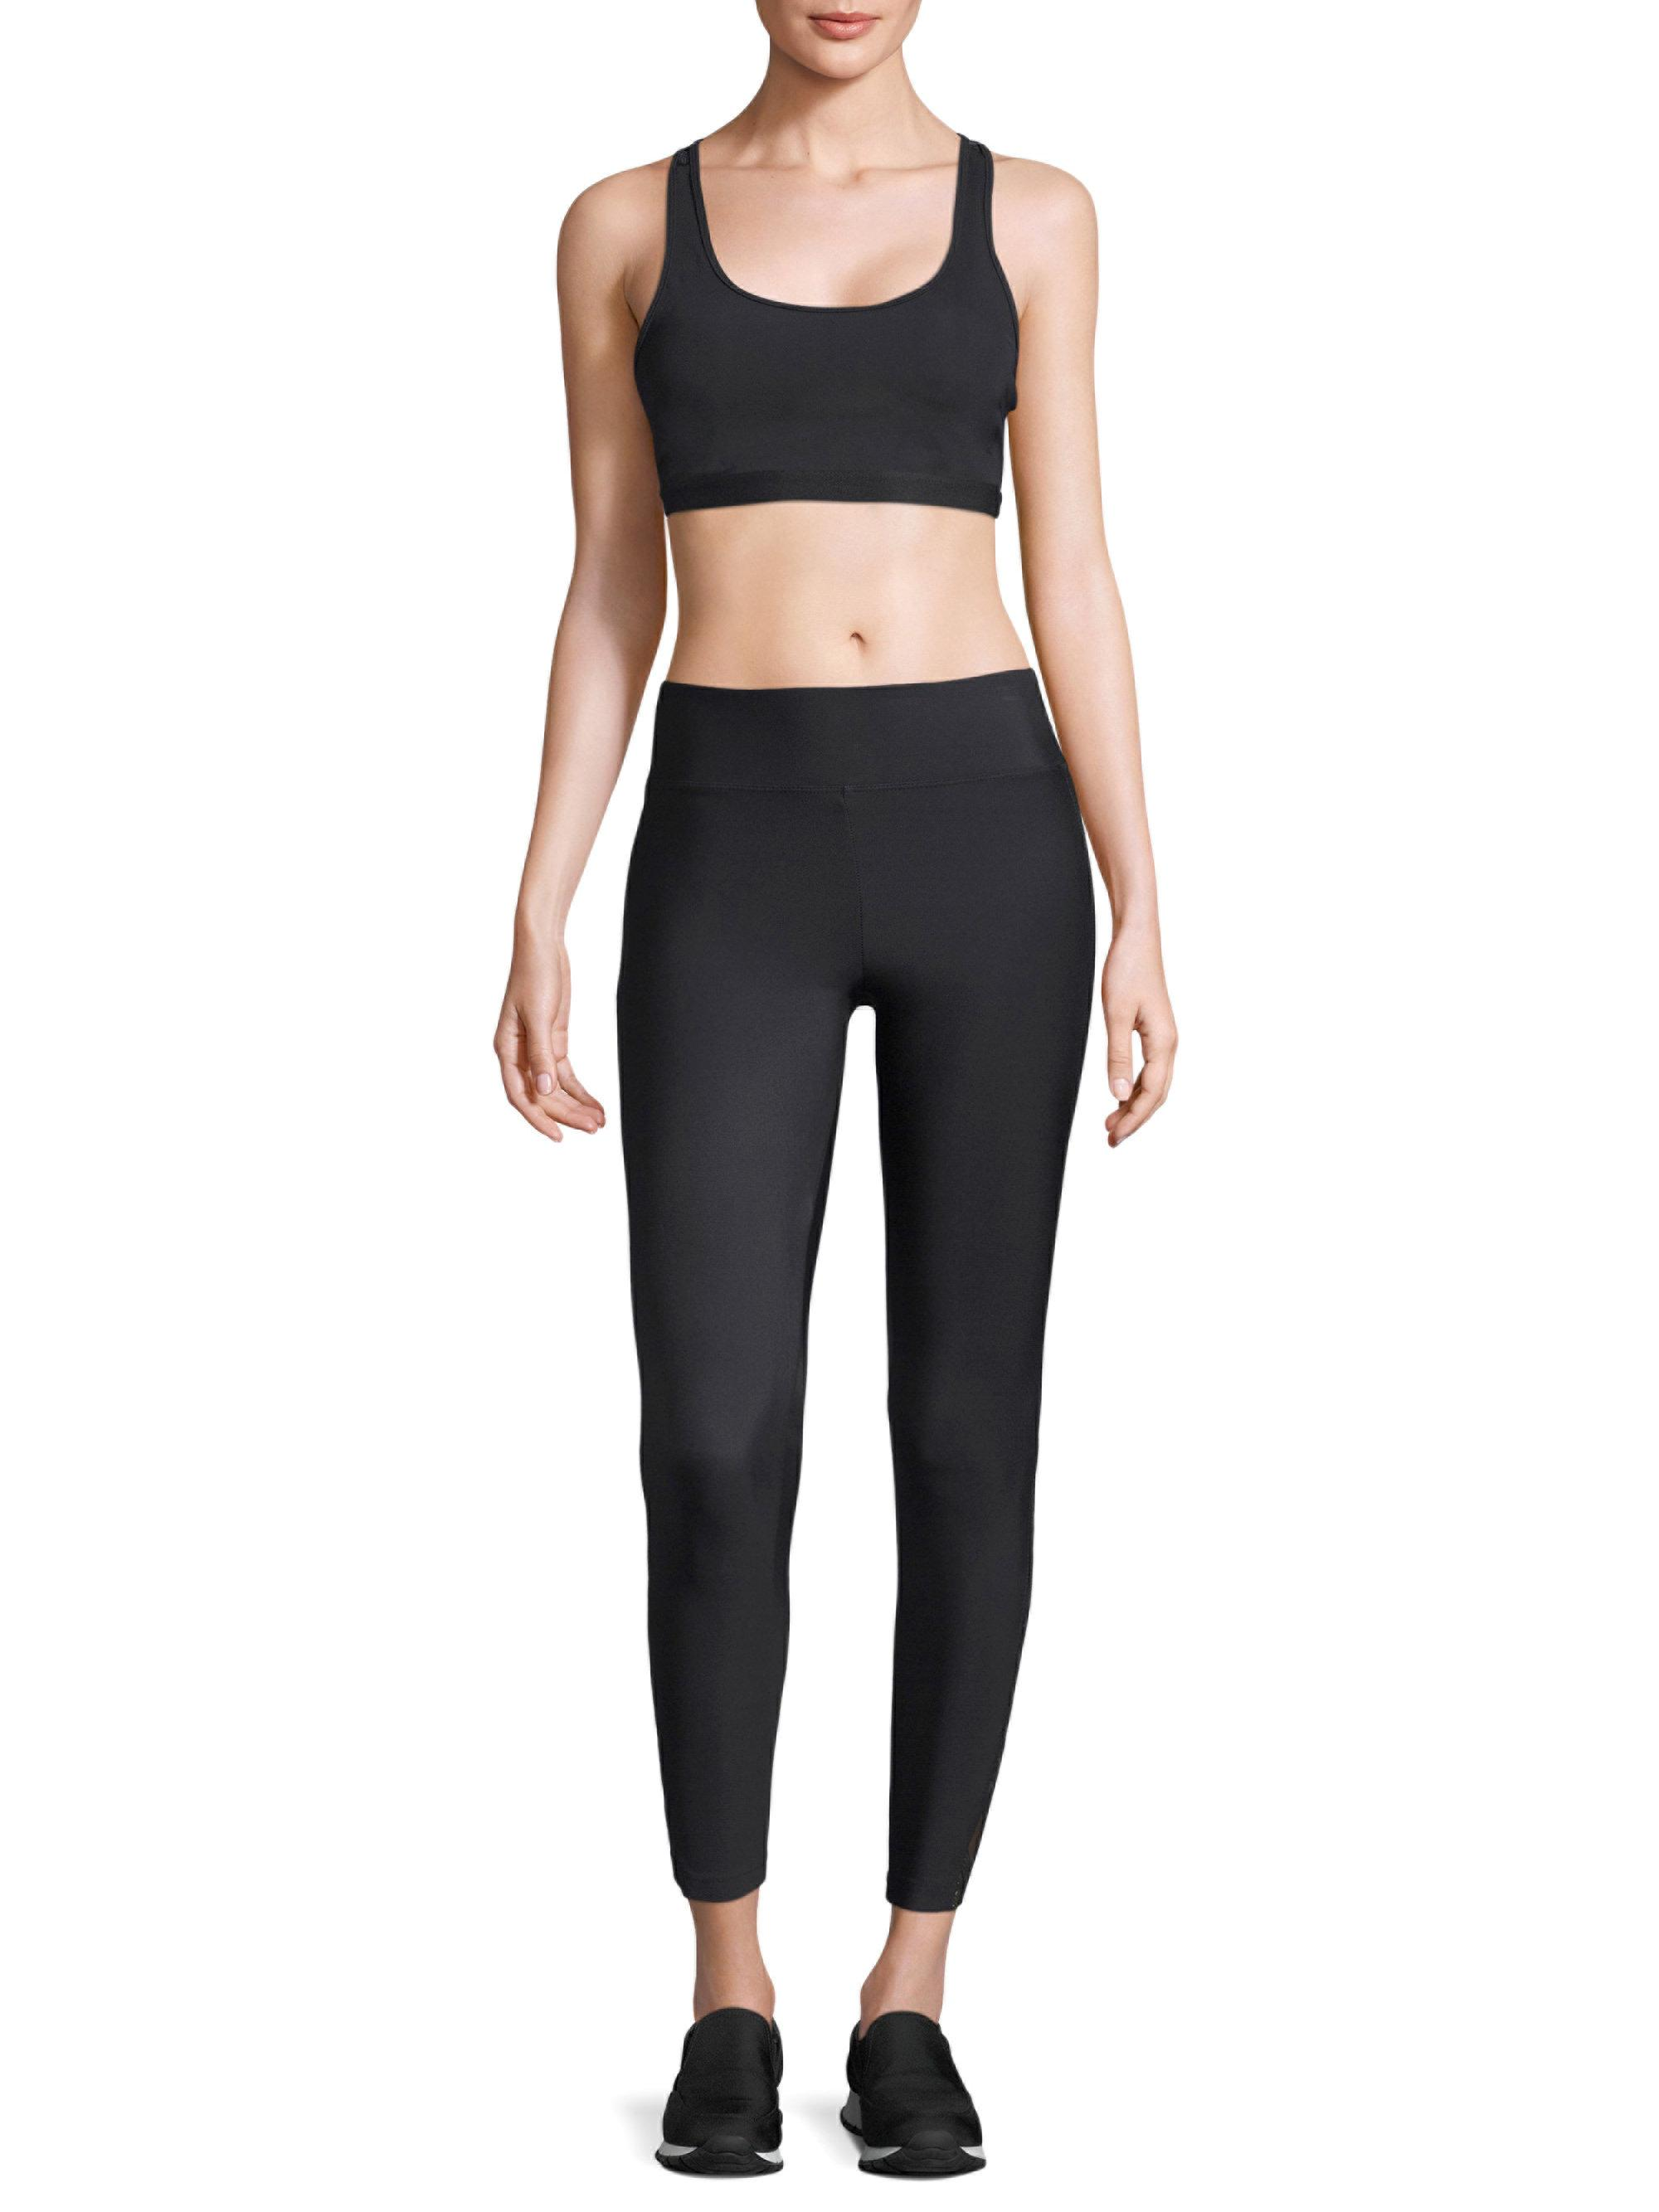 7e6478c526 Lyst - Koral Posture Sports Bra in Black